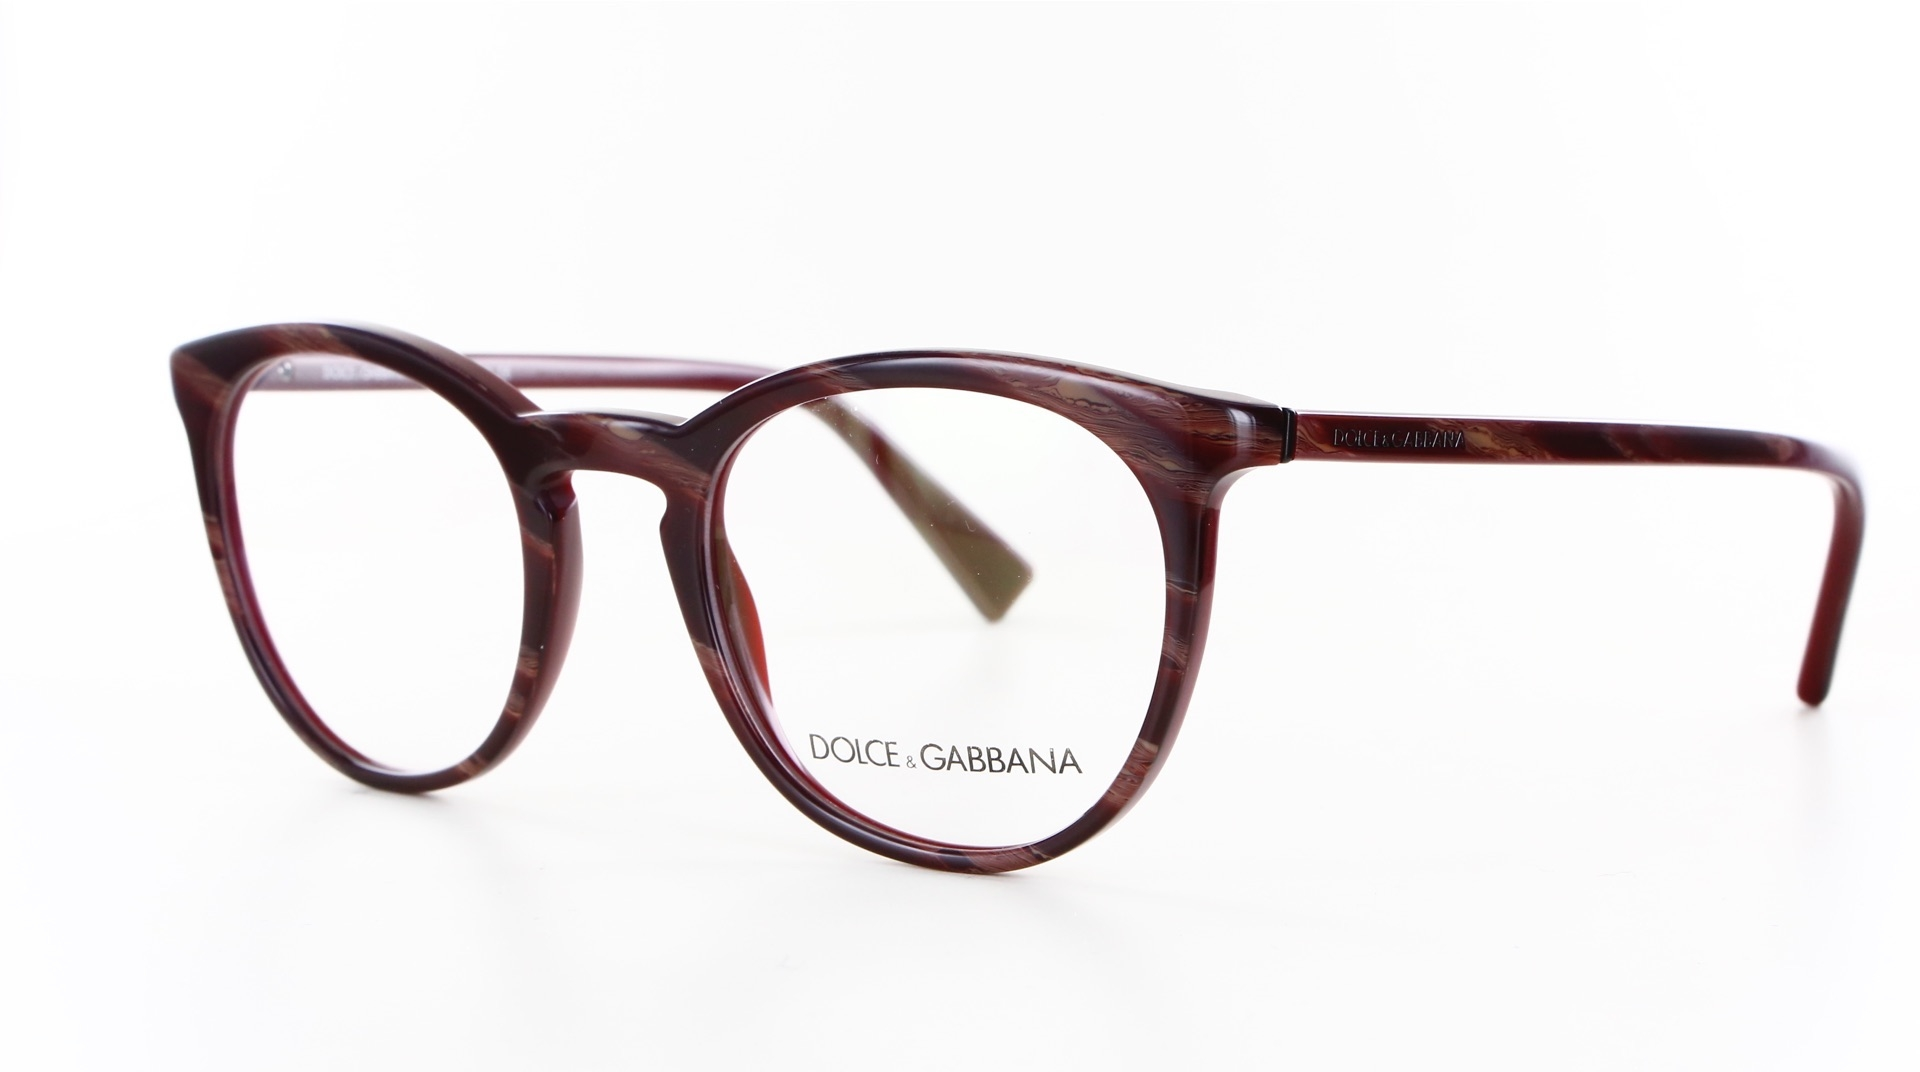 Dolce & Gabbana - ref: 76710